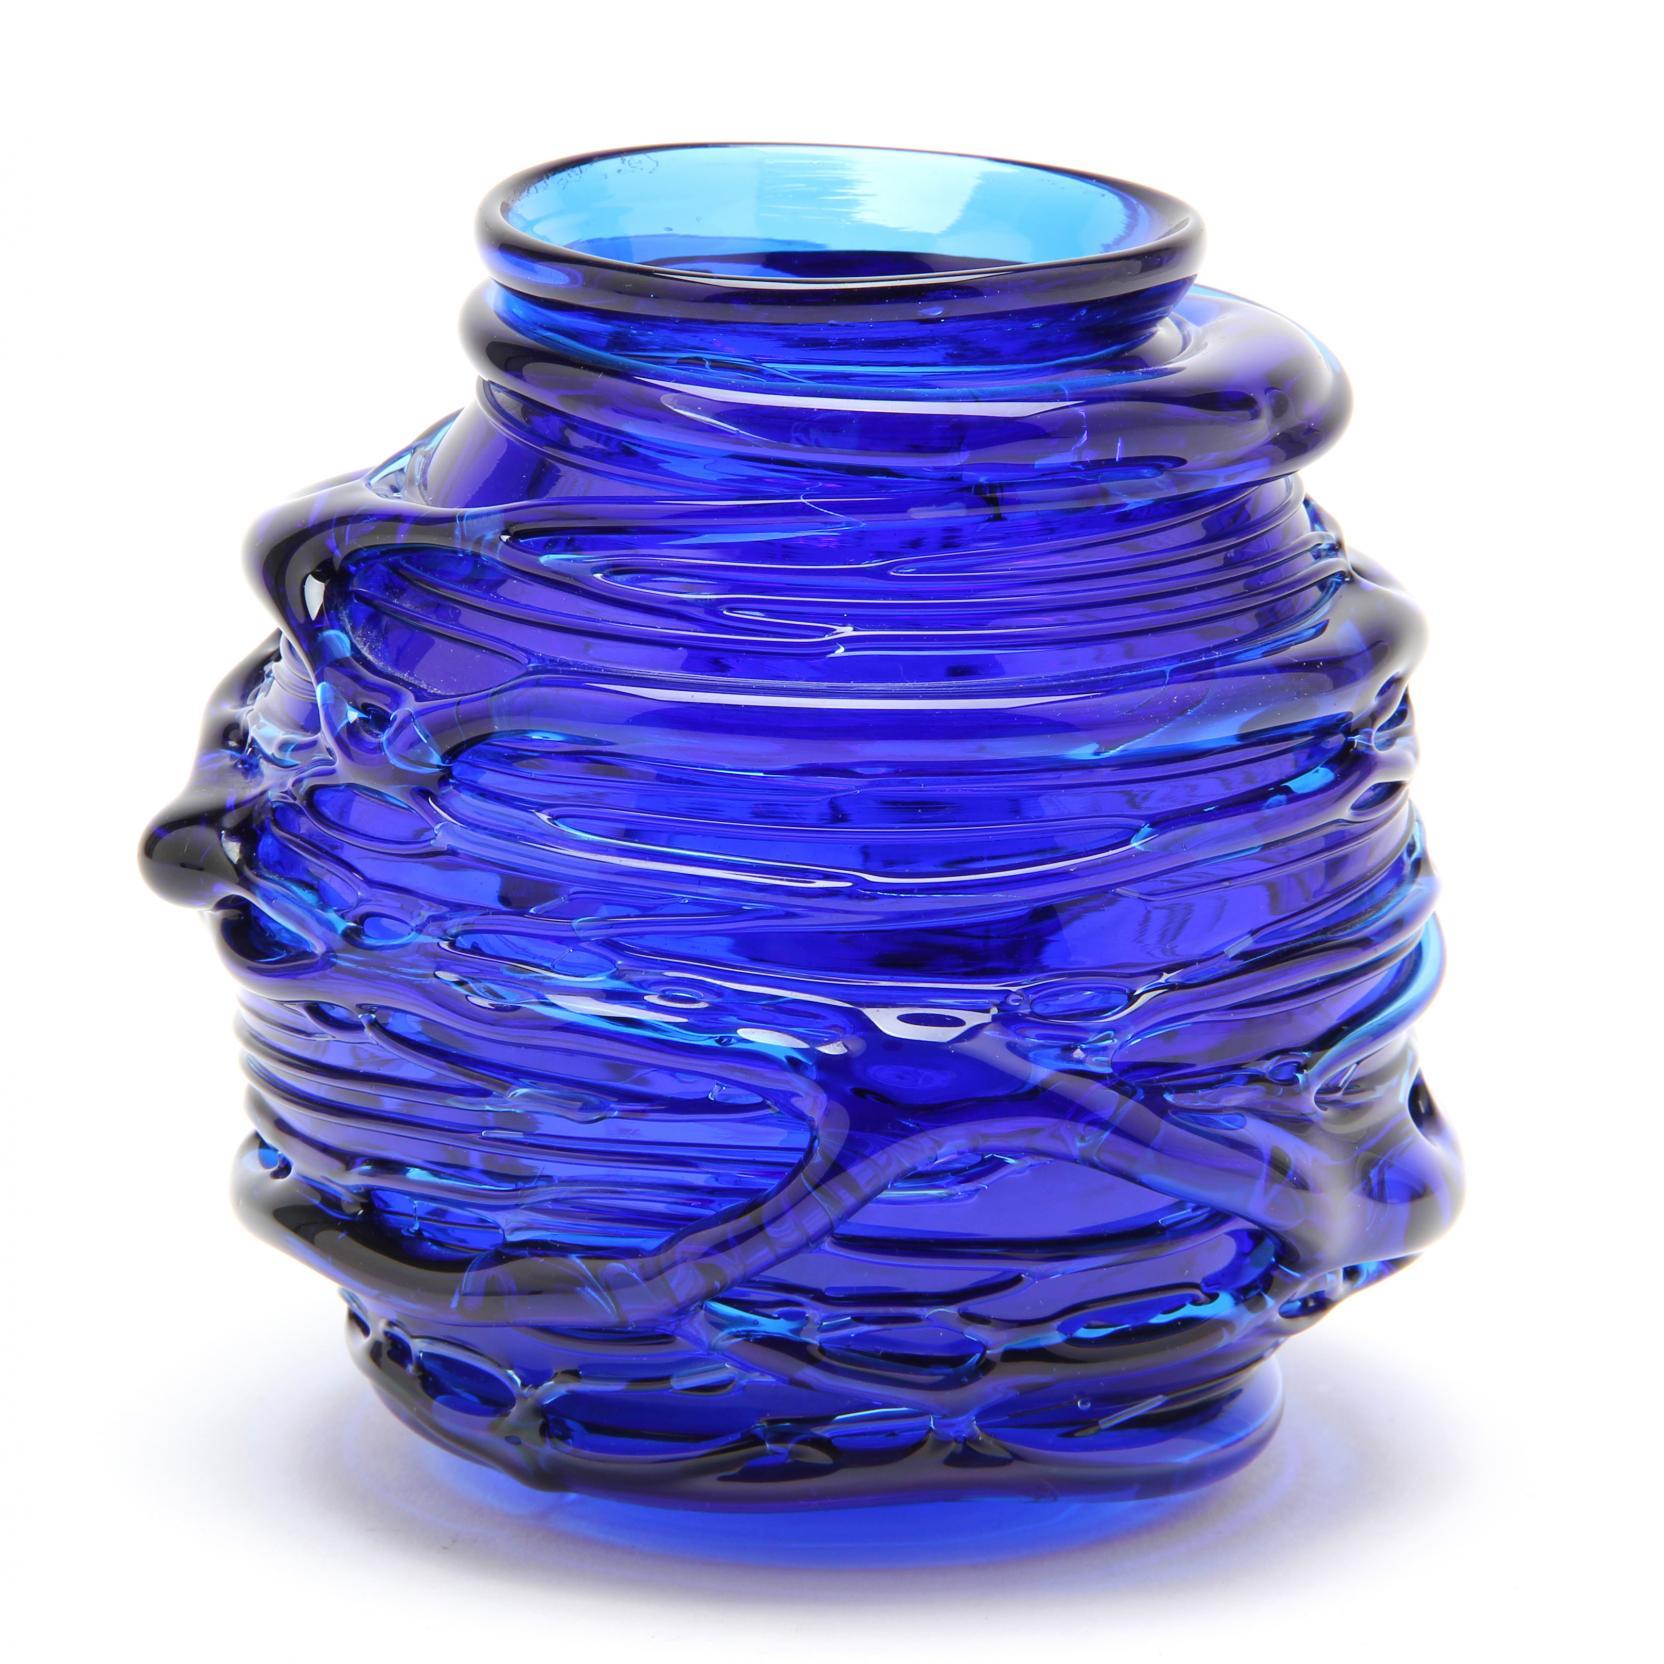 RICHARD HARKNESS New Hampshire Studio Art GLASS Blue Lily Pad Vase 7\u201d unsigned